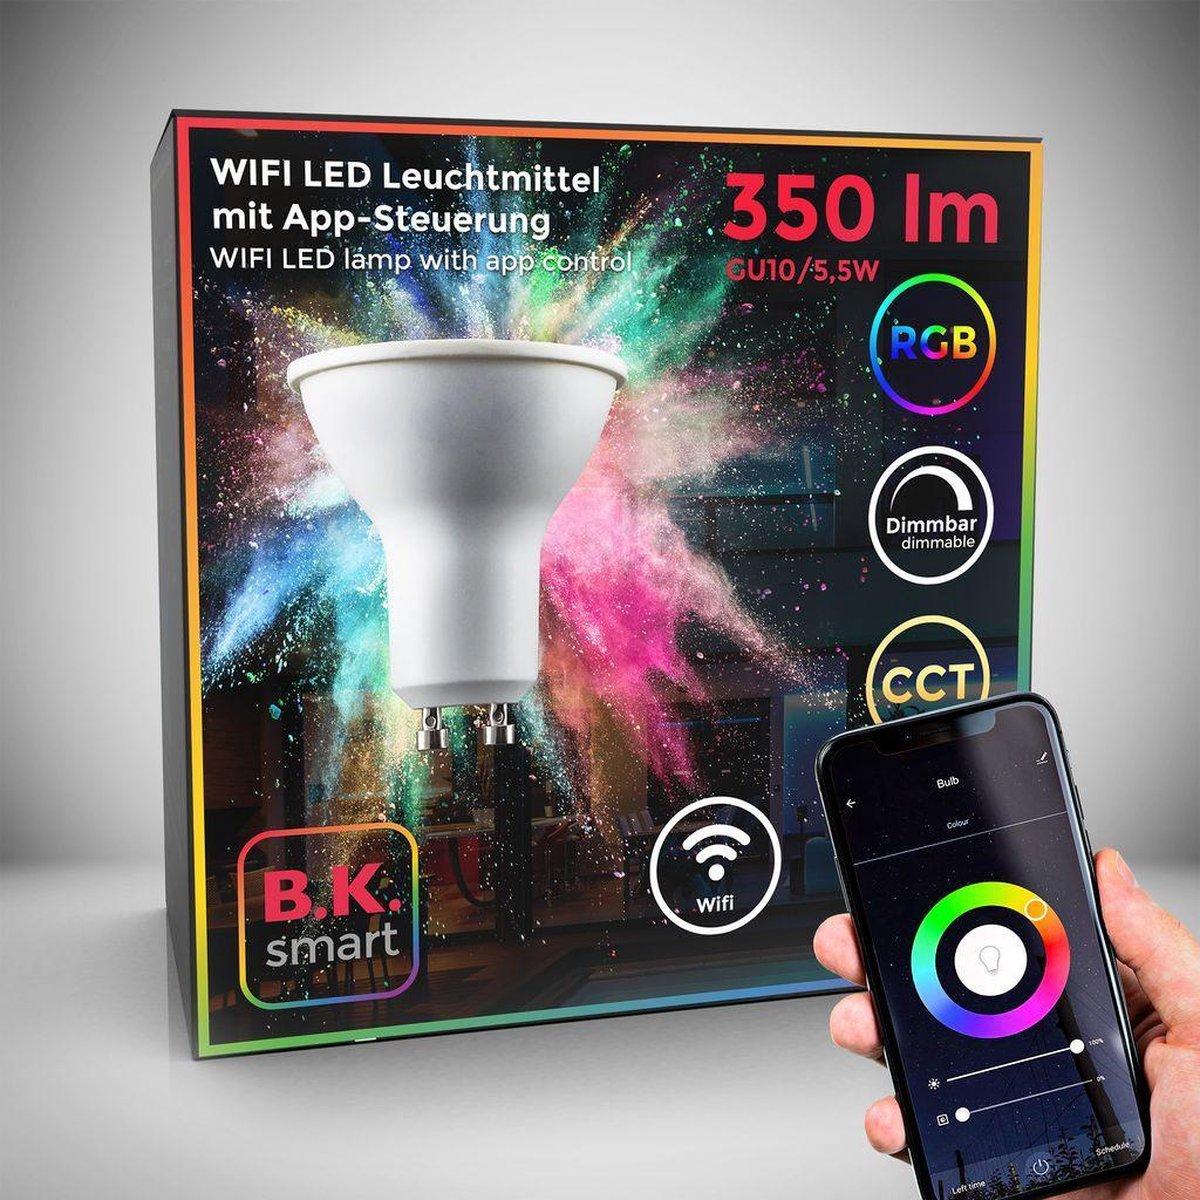 B.K.Licht - Slimme Lichtbron - RGB en CCT - smart lamp - met GU10 - 5.5W LED - WiFi - App - 2.700K to 6.500K - 350 Lm - voice control - color lampjes - LED lamp